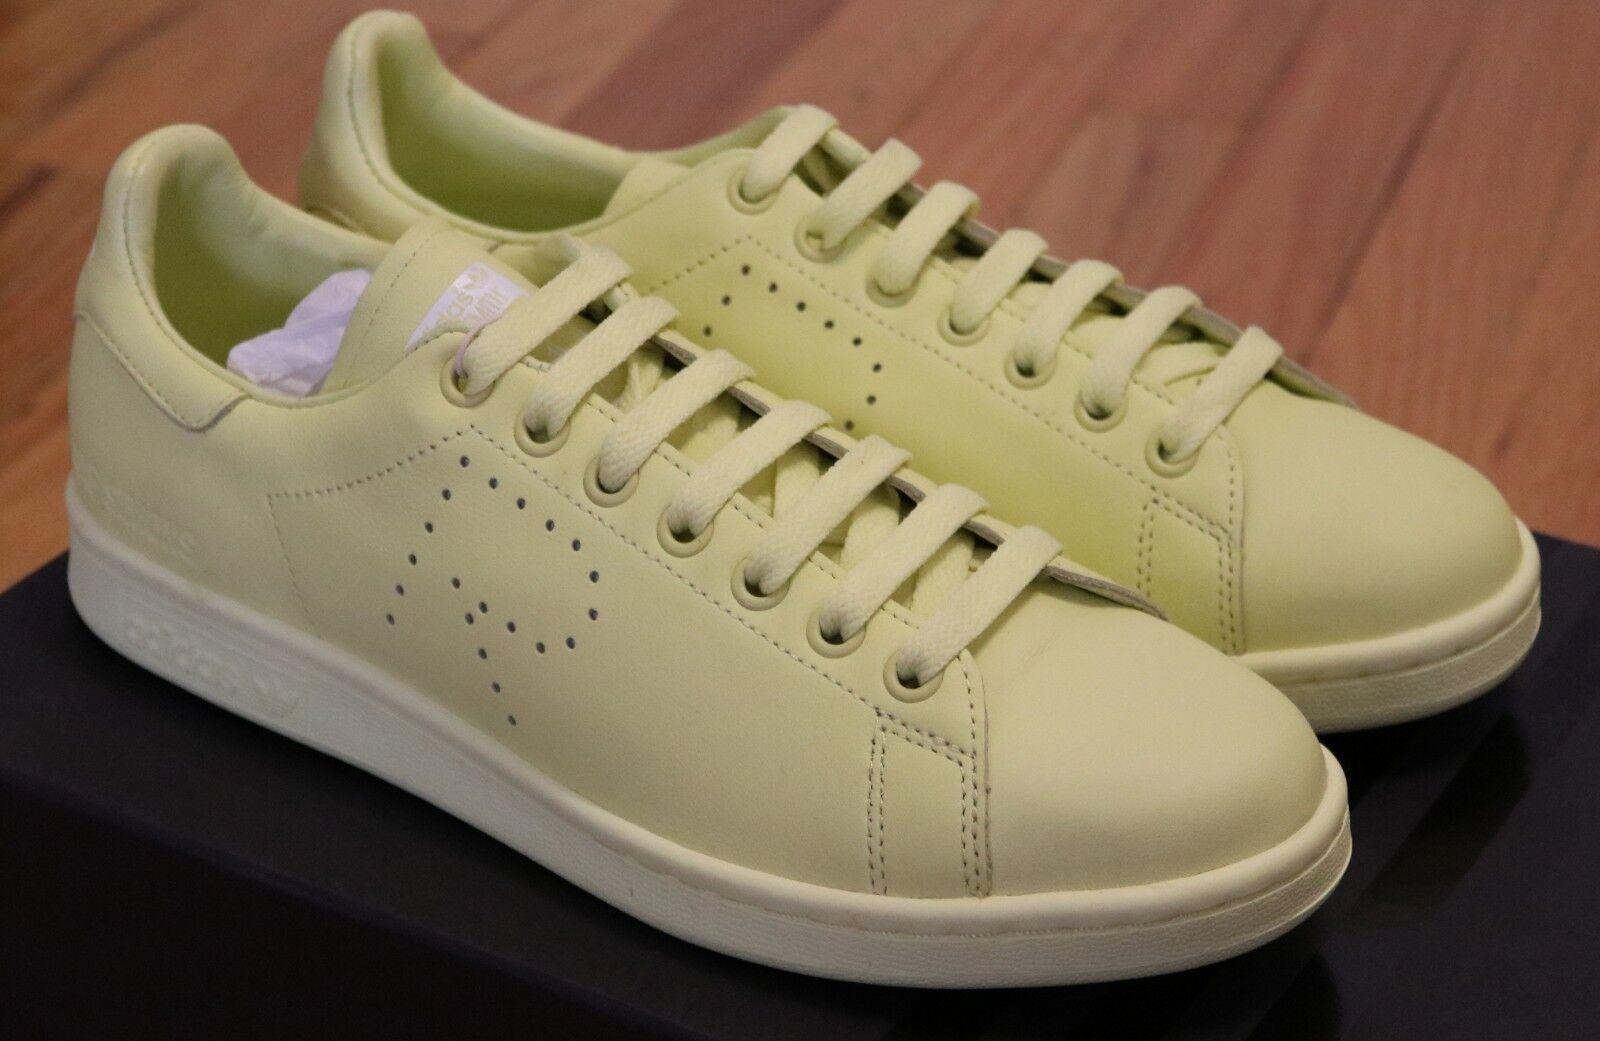 Raf Simons x Adidas Stan Smith Yellow Sneakers Brand New in Box Size 7.5 8